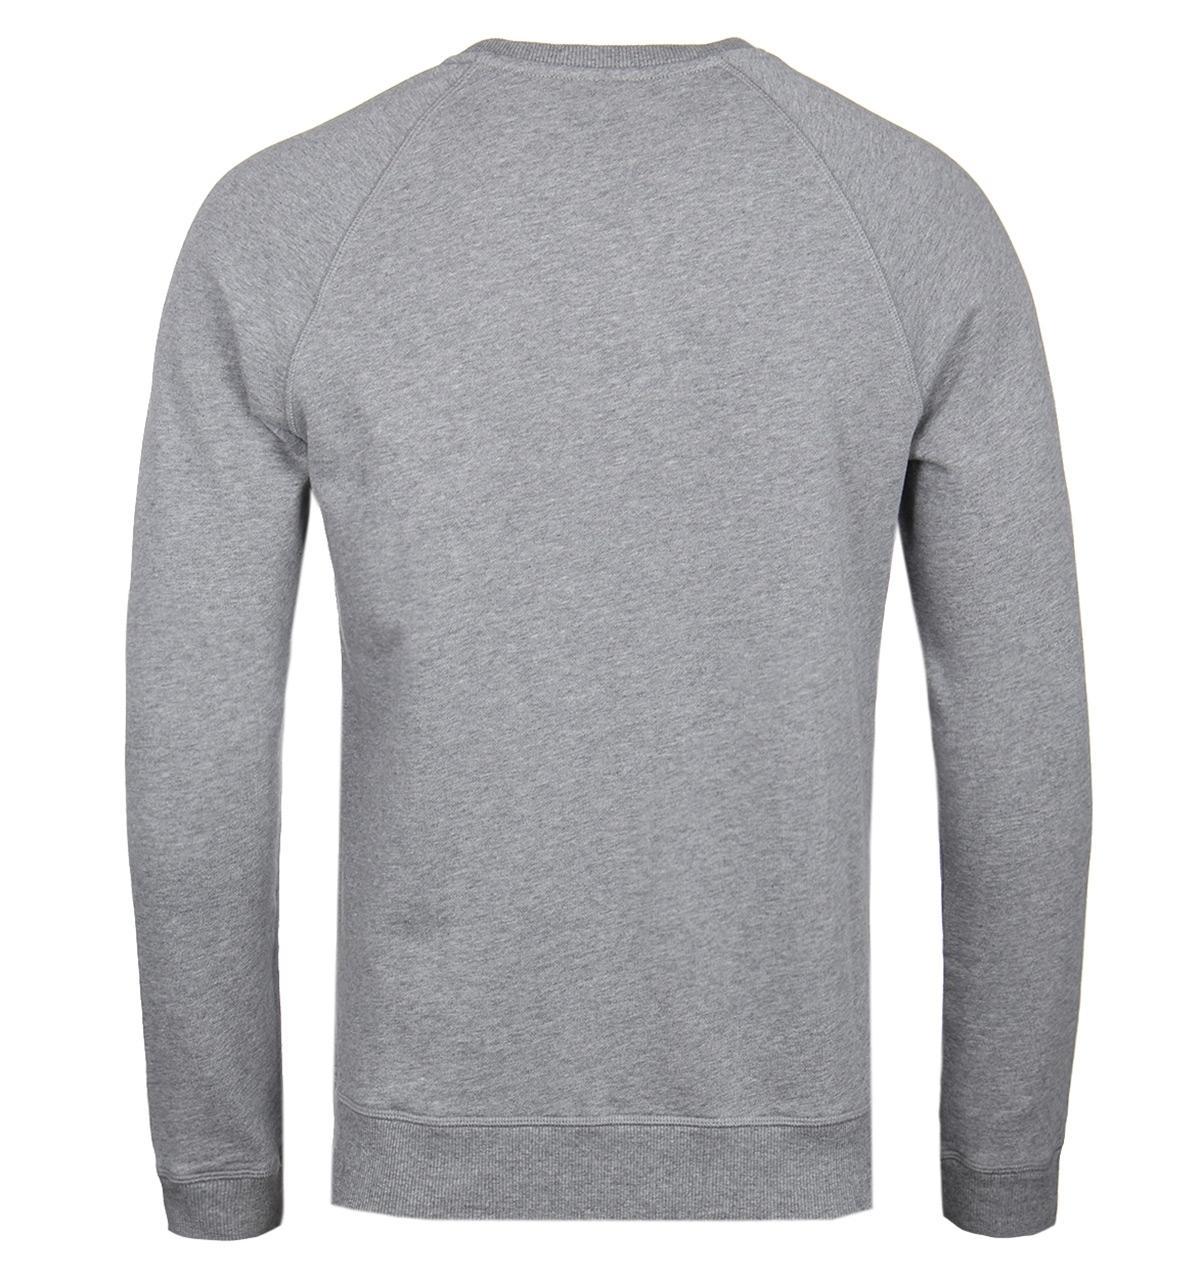 ee0cae844 BOSS Orange - Gray Boss Wyan Grey Marl Sweatshirt for Men - Lyst. View  fullscreen